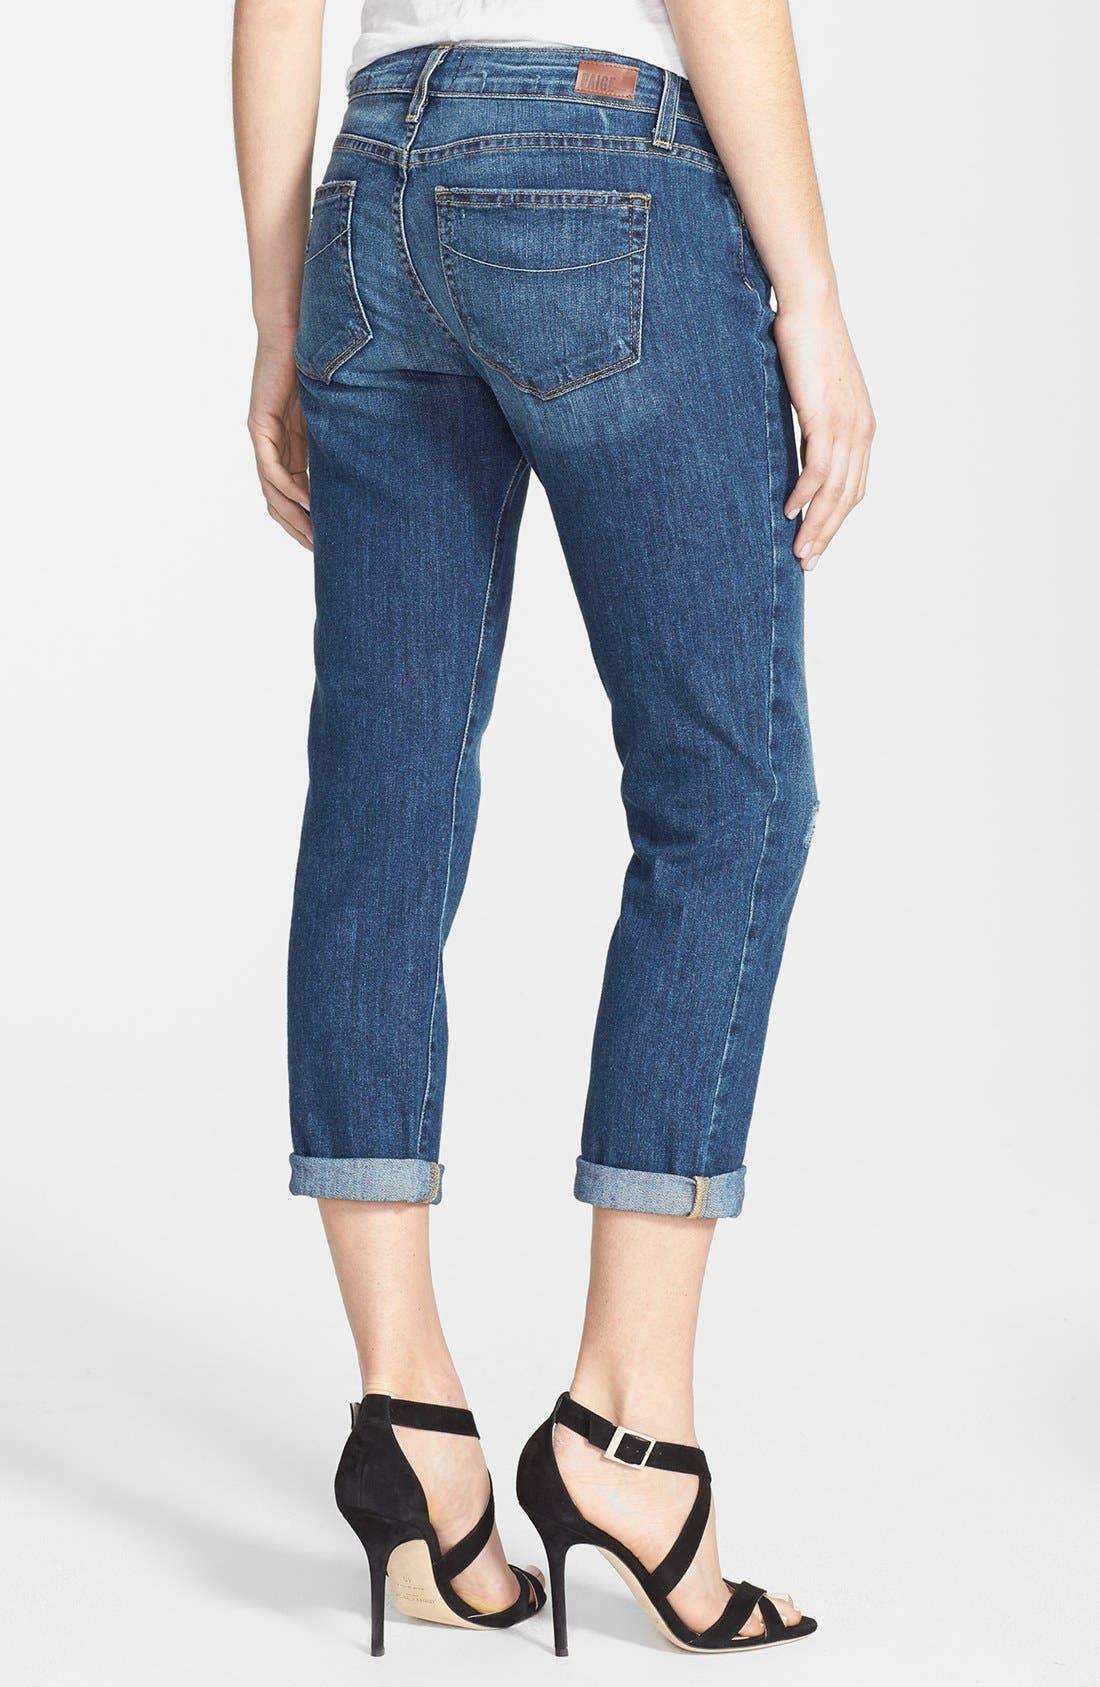 Alternate Image 2  - Paige Denim 'Jimmy Jimmy' Distressed Crop Jeans (Luca)